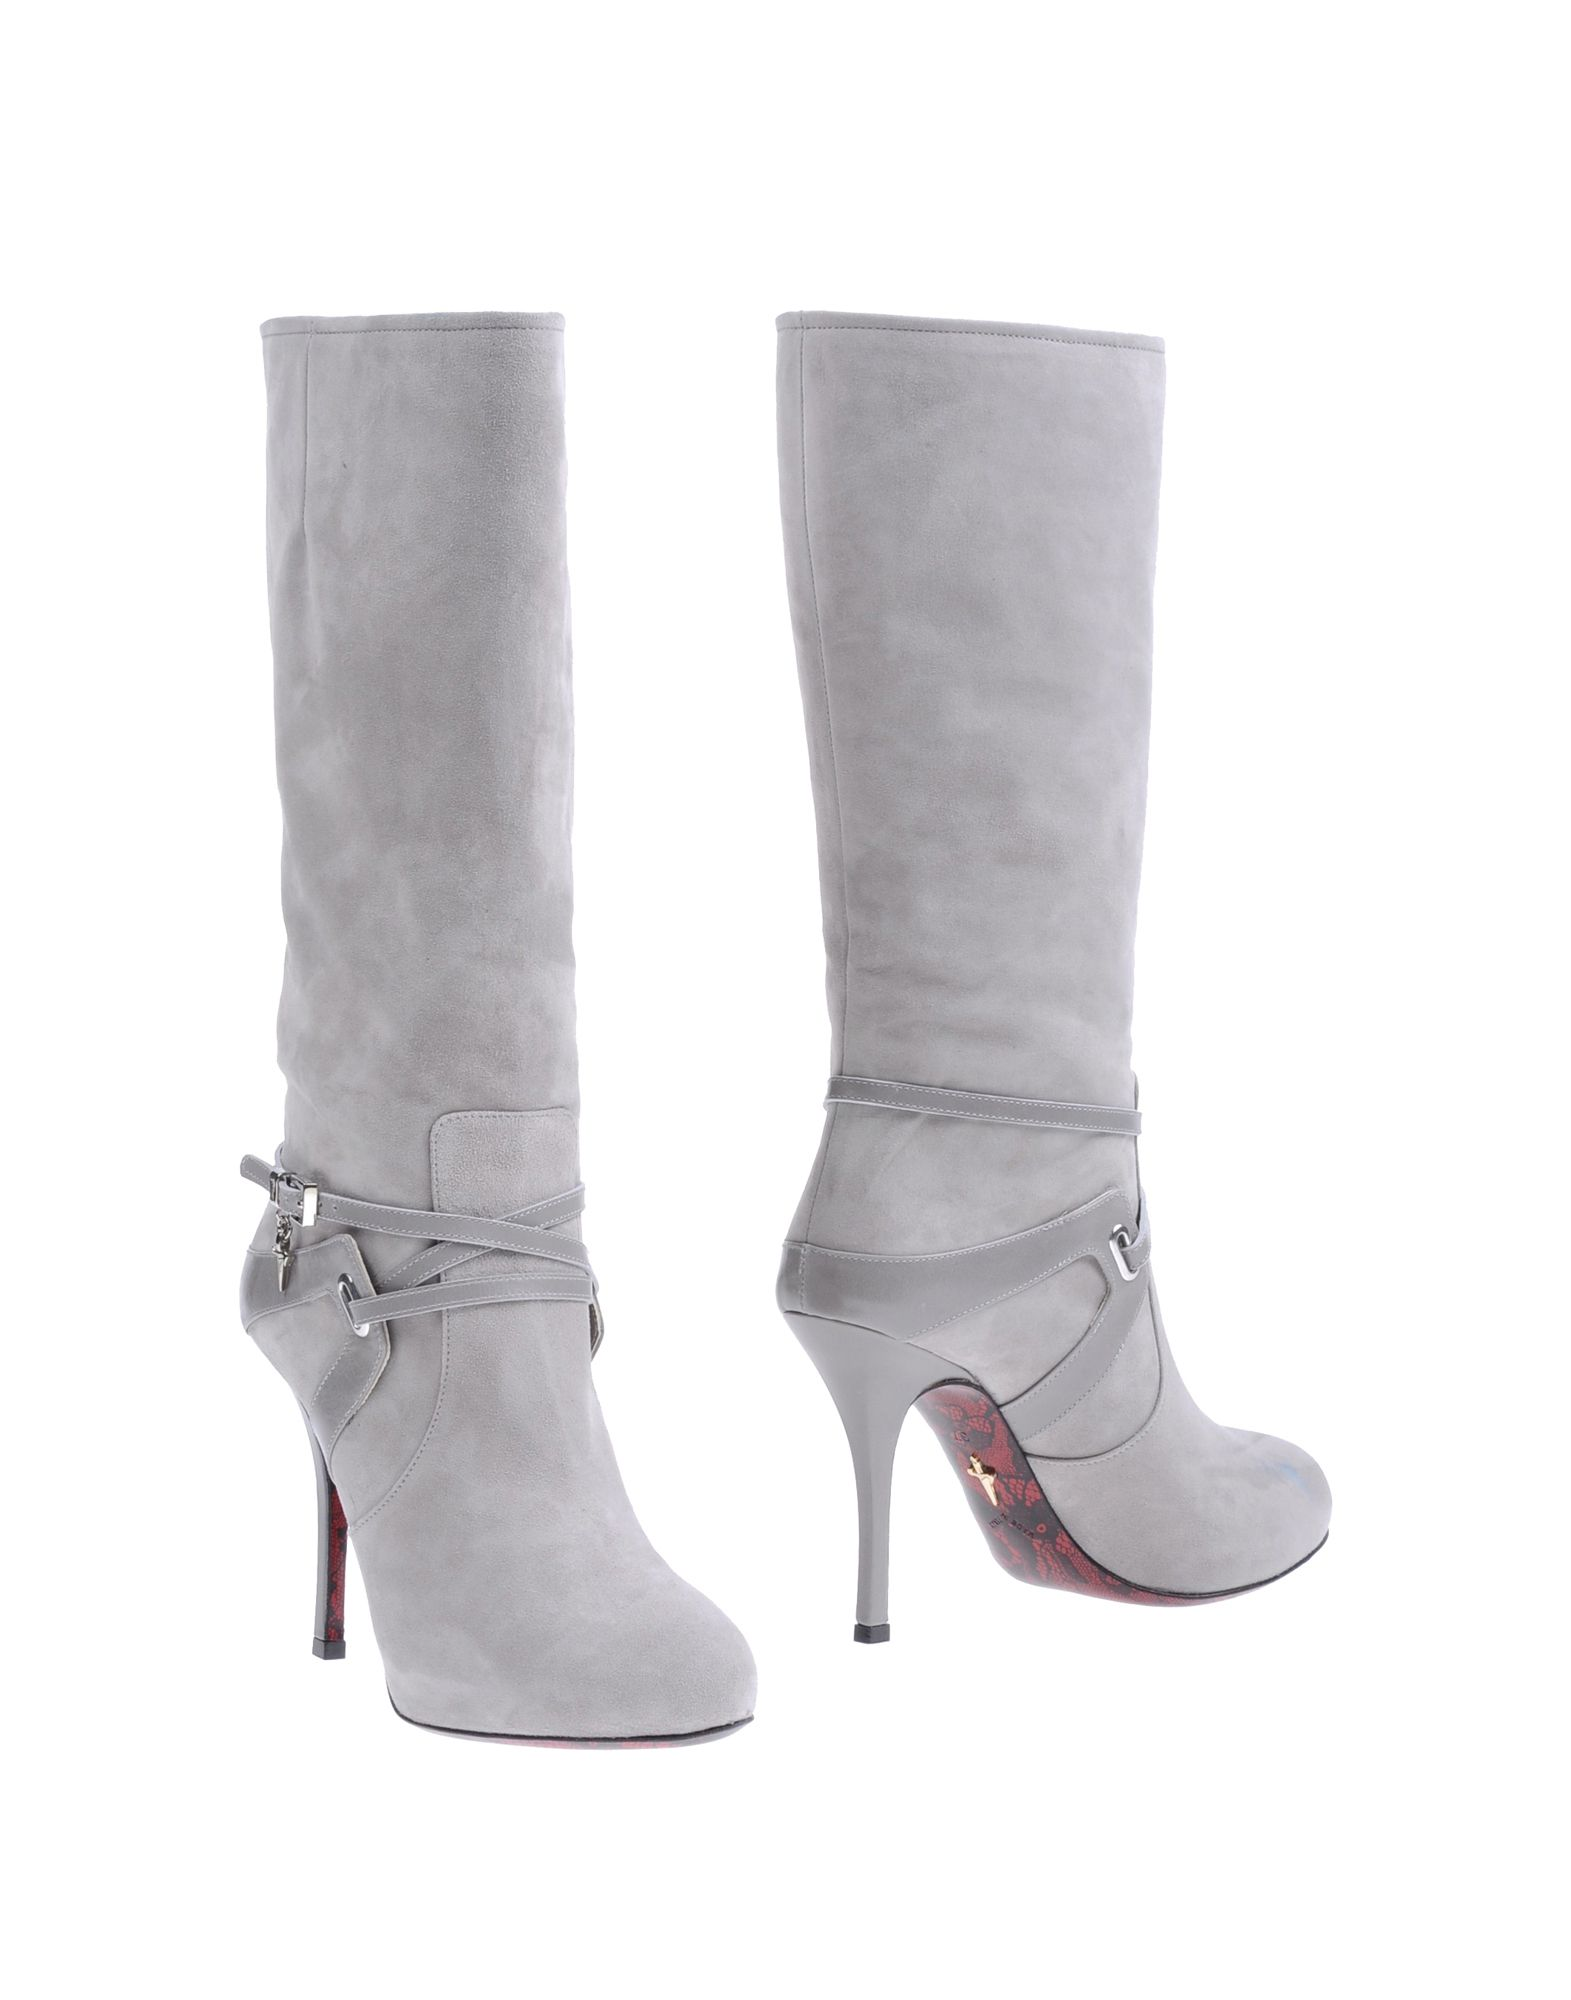 cesare paciotti high heel knee high boots in gray light